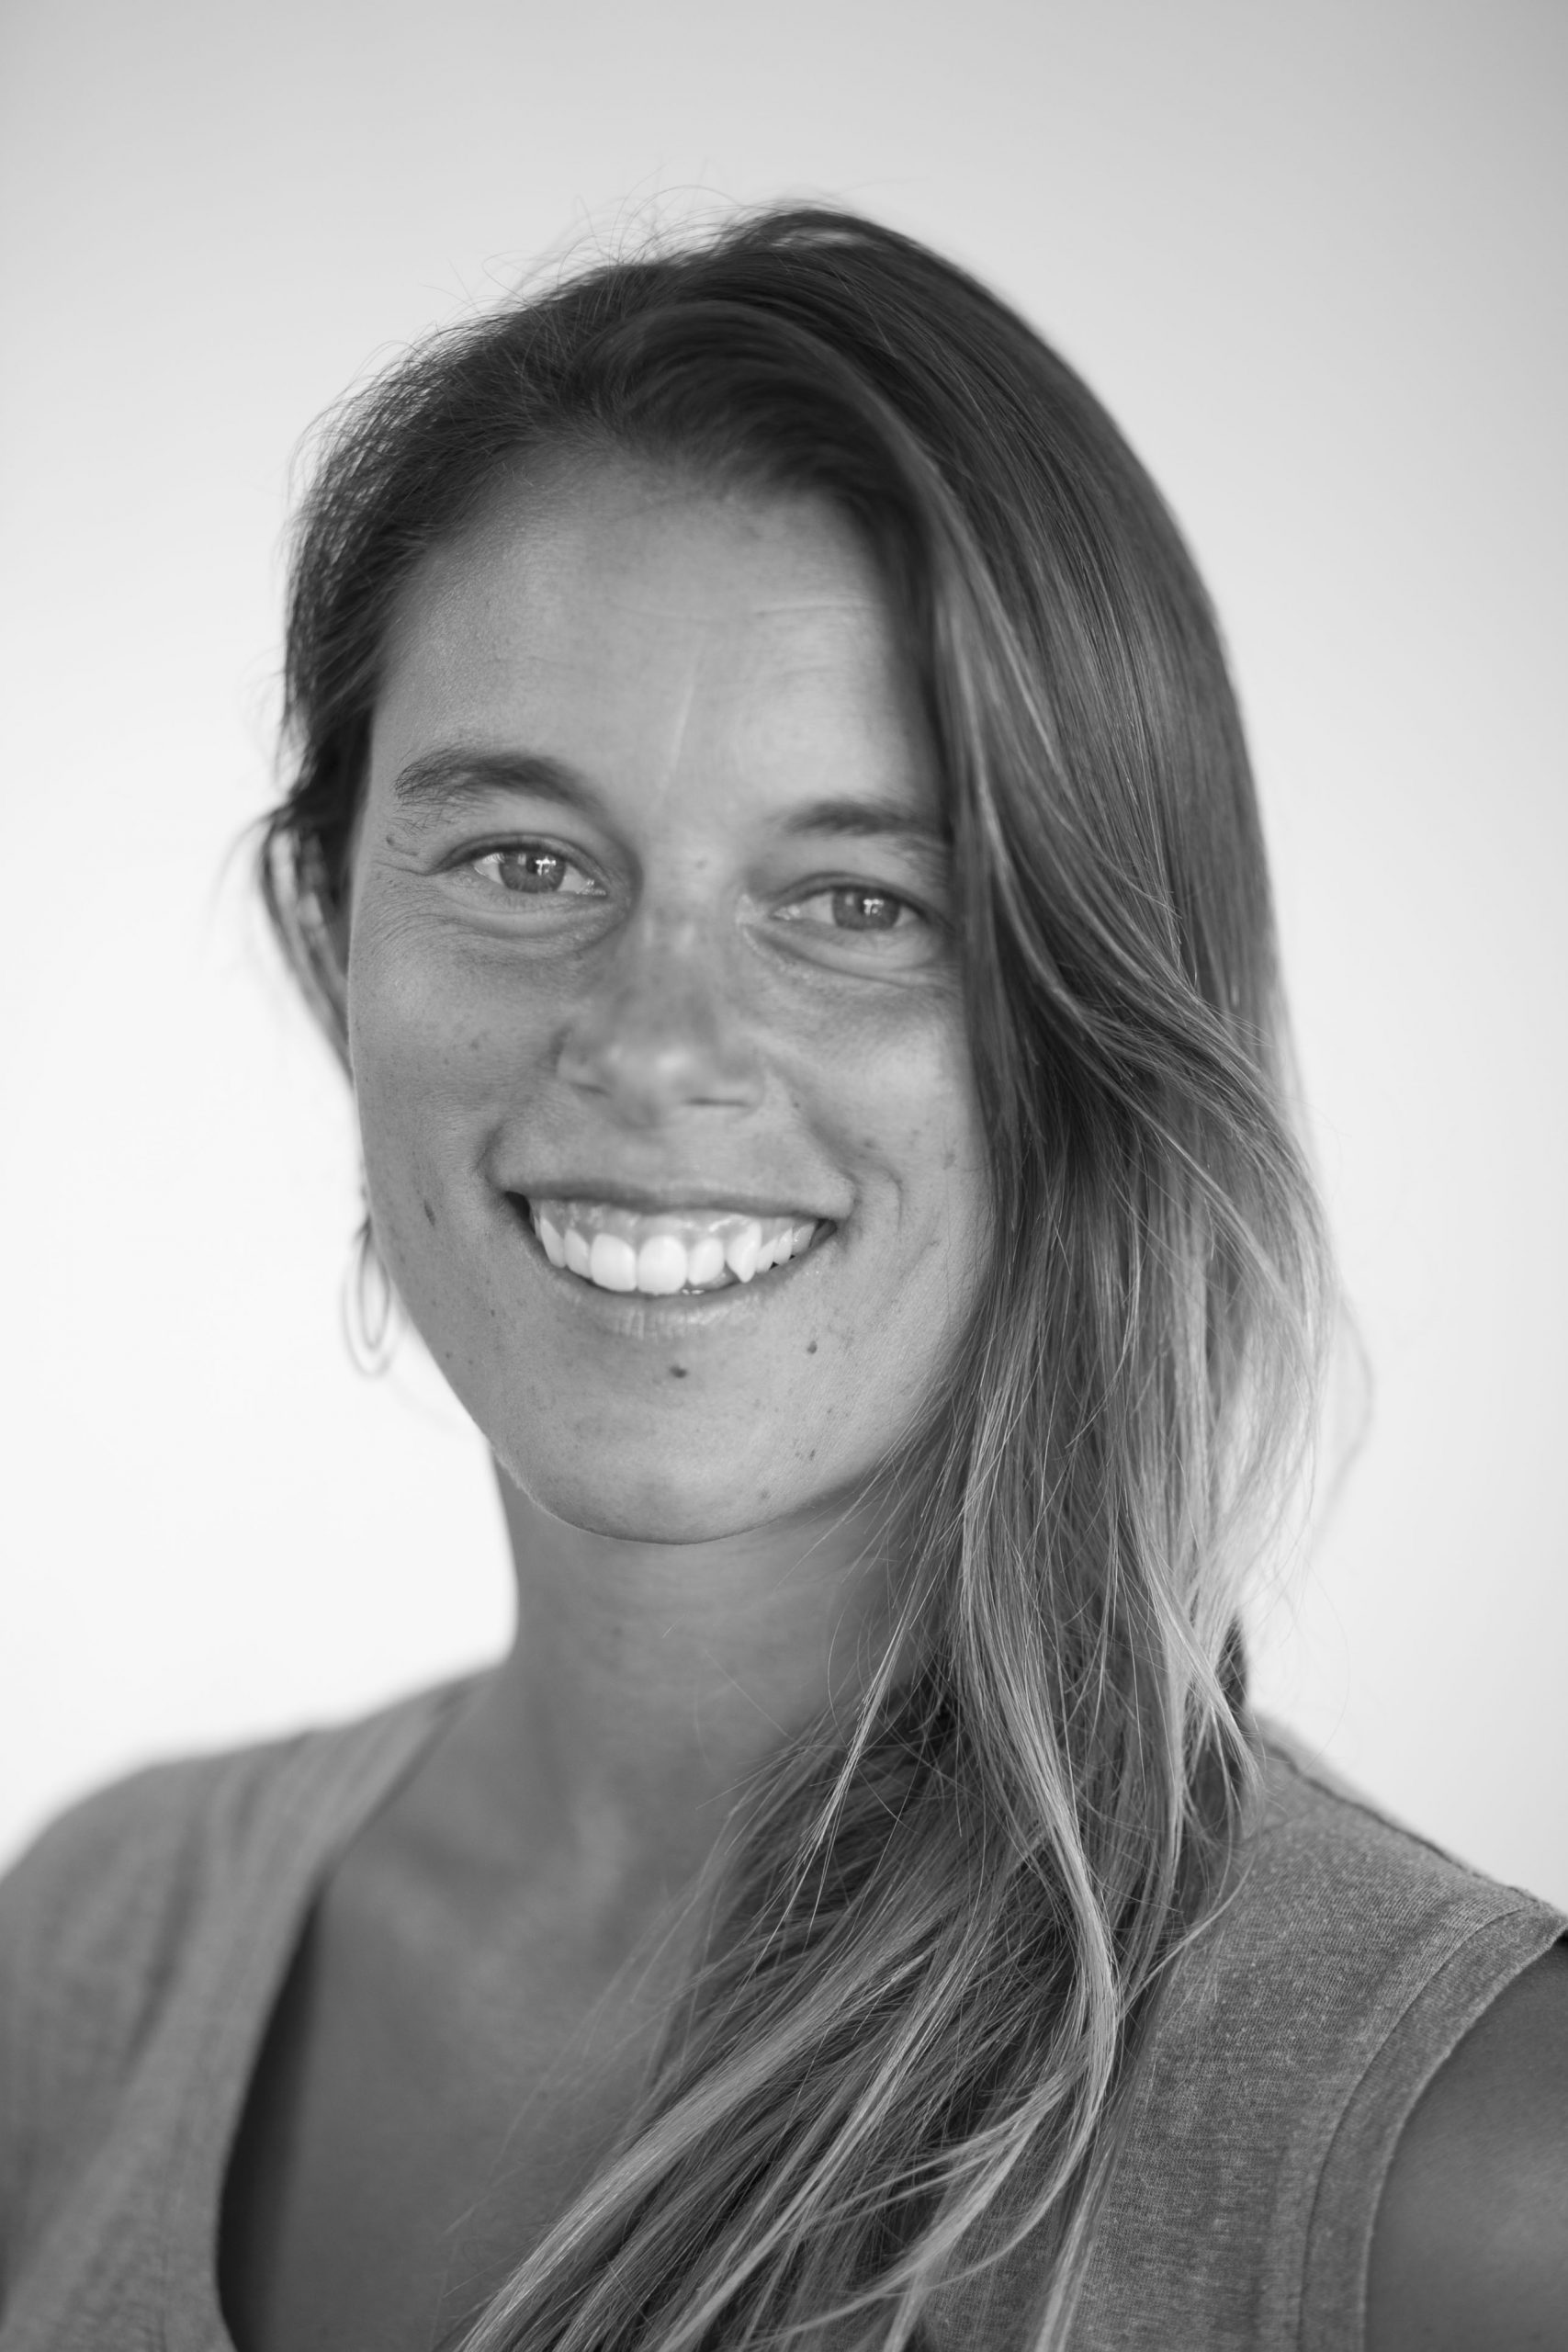 Erica Hartnick